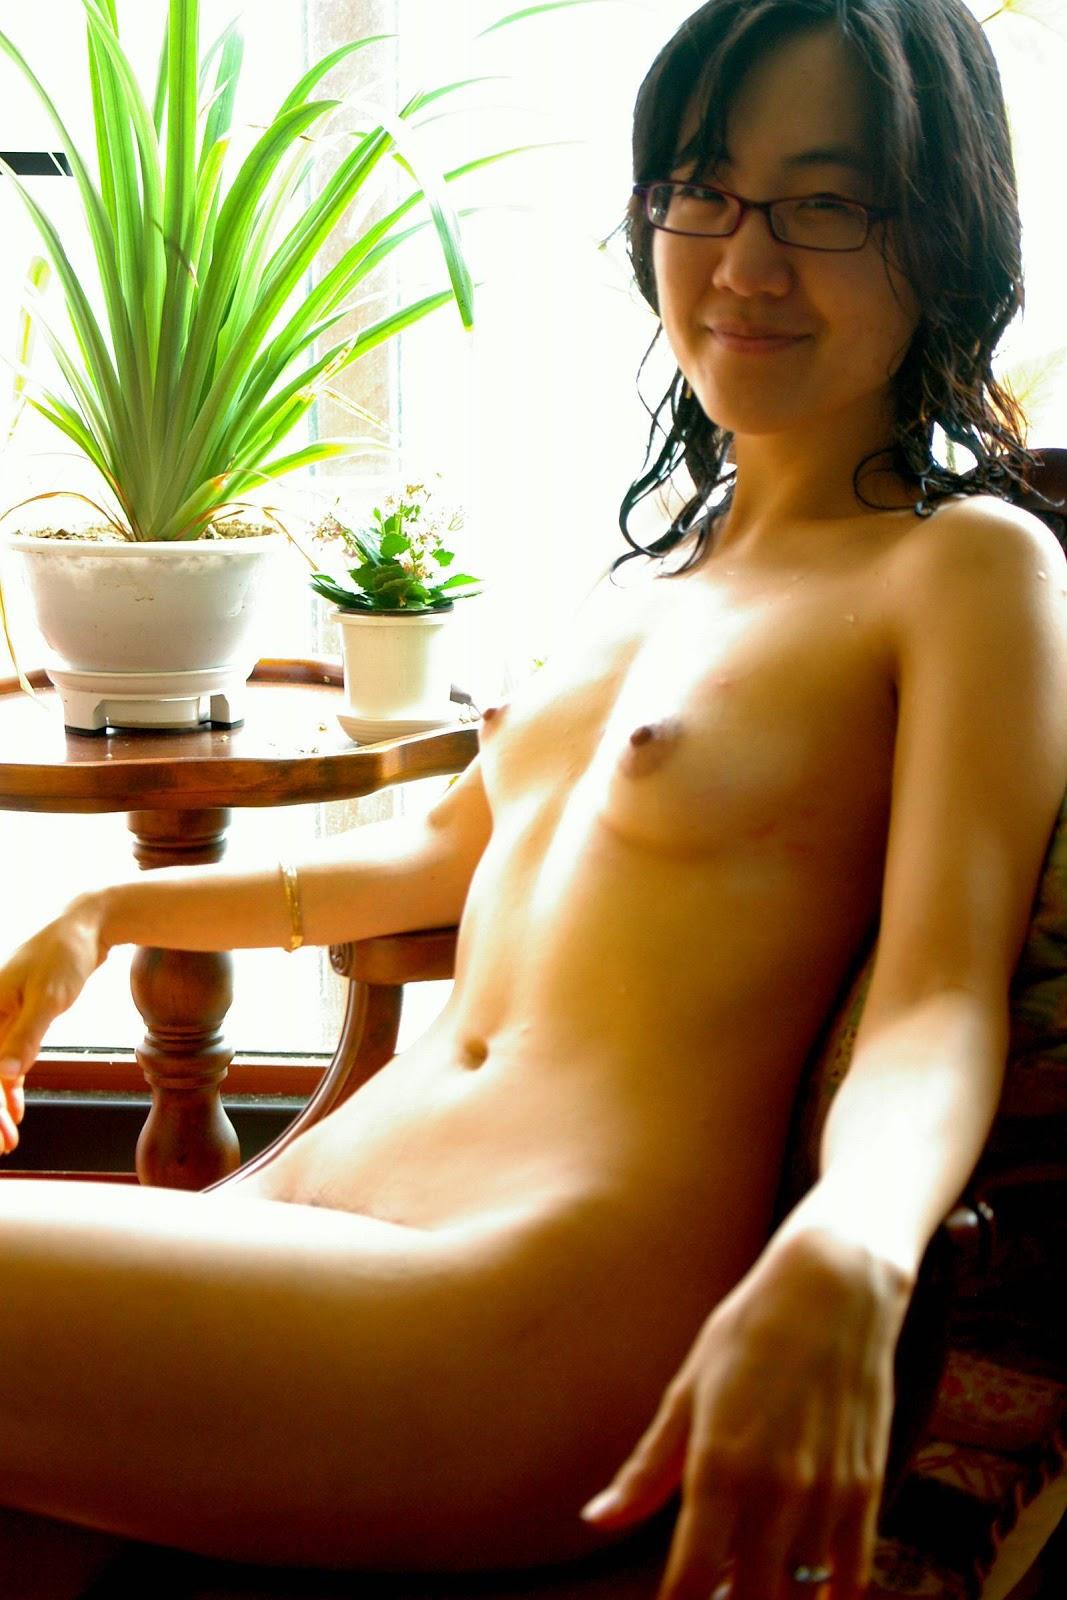 Koria women fucking hot sex vidio photo 350